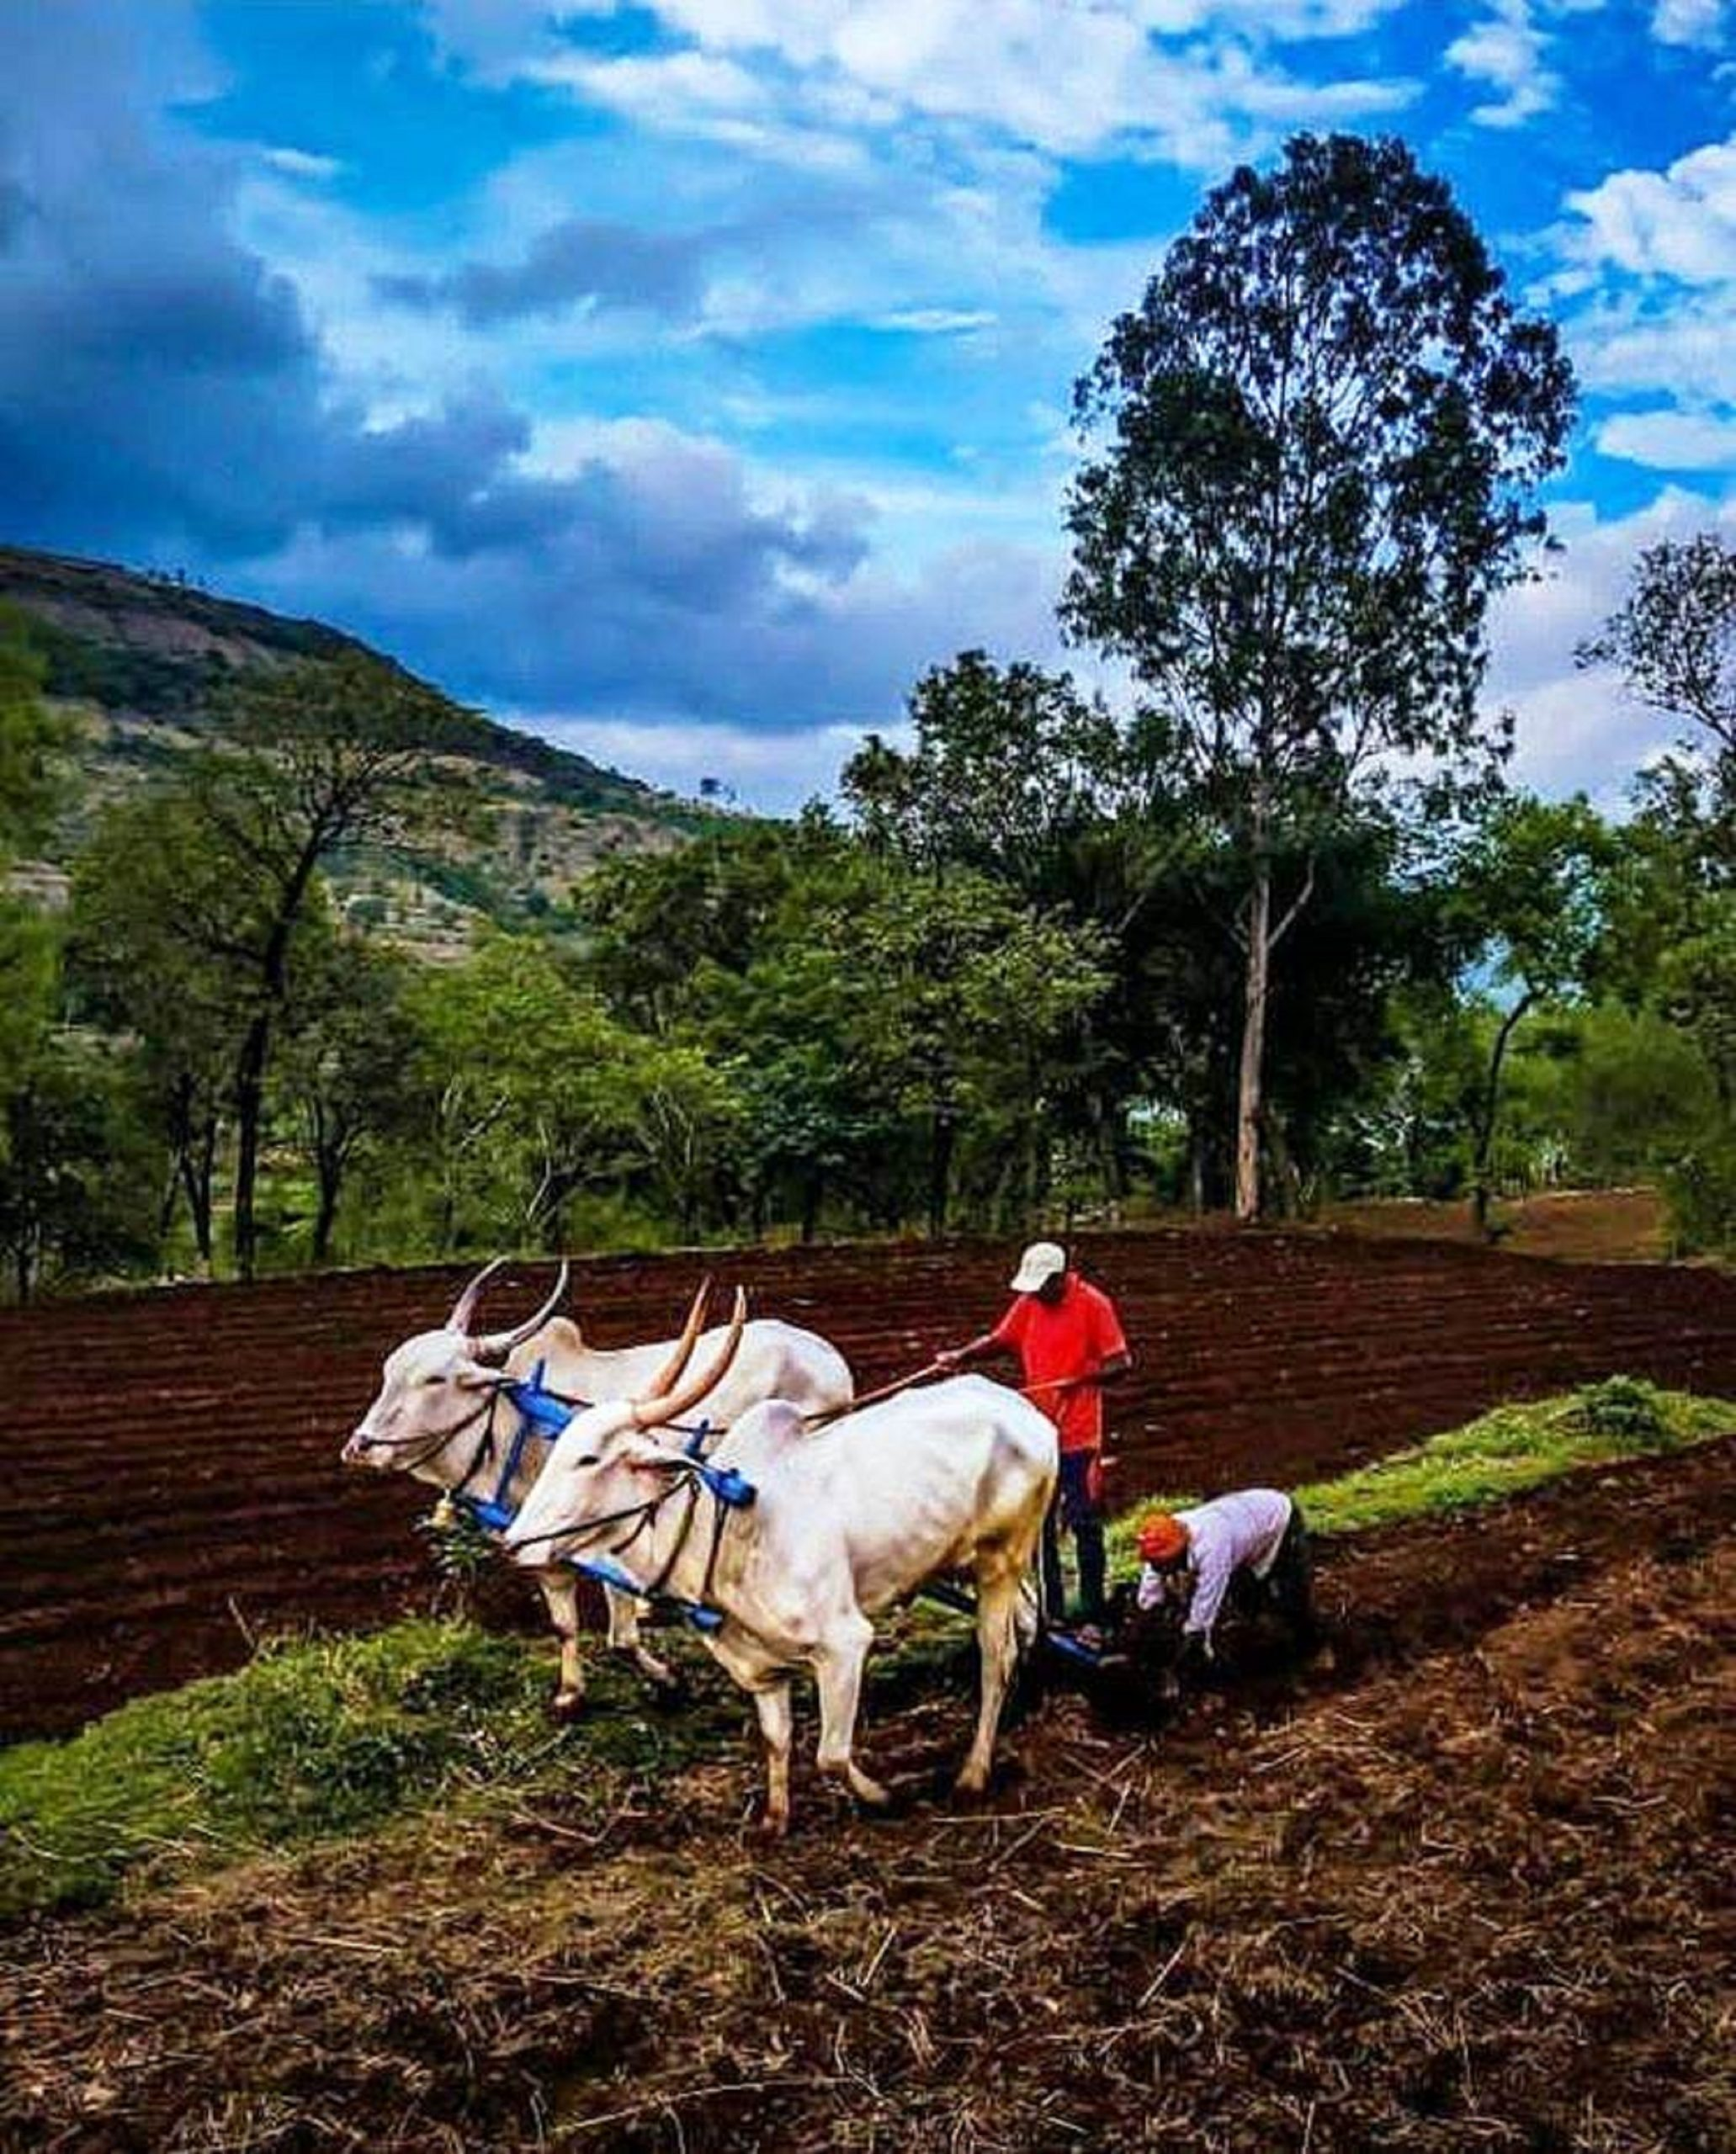 farmer with bullocks in the field